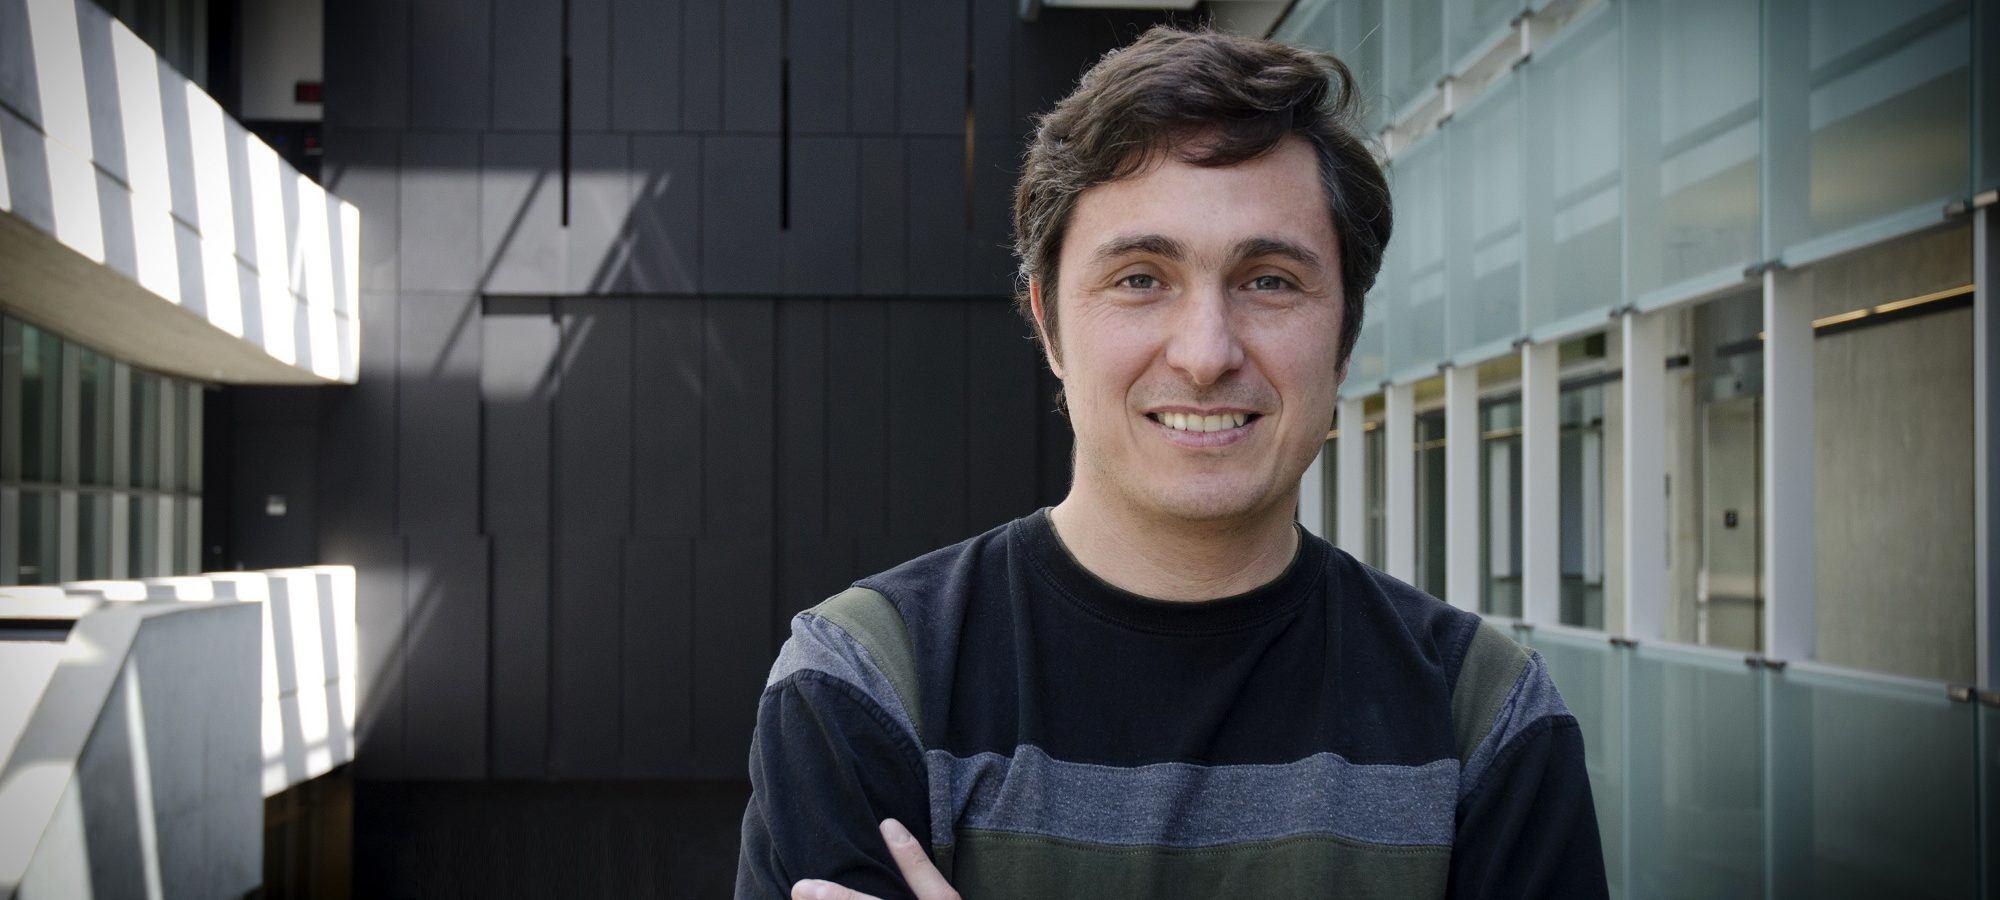 Luis Lehner